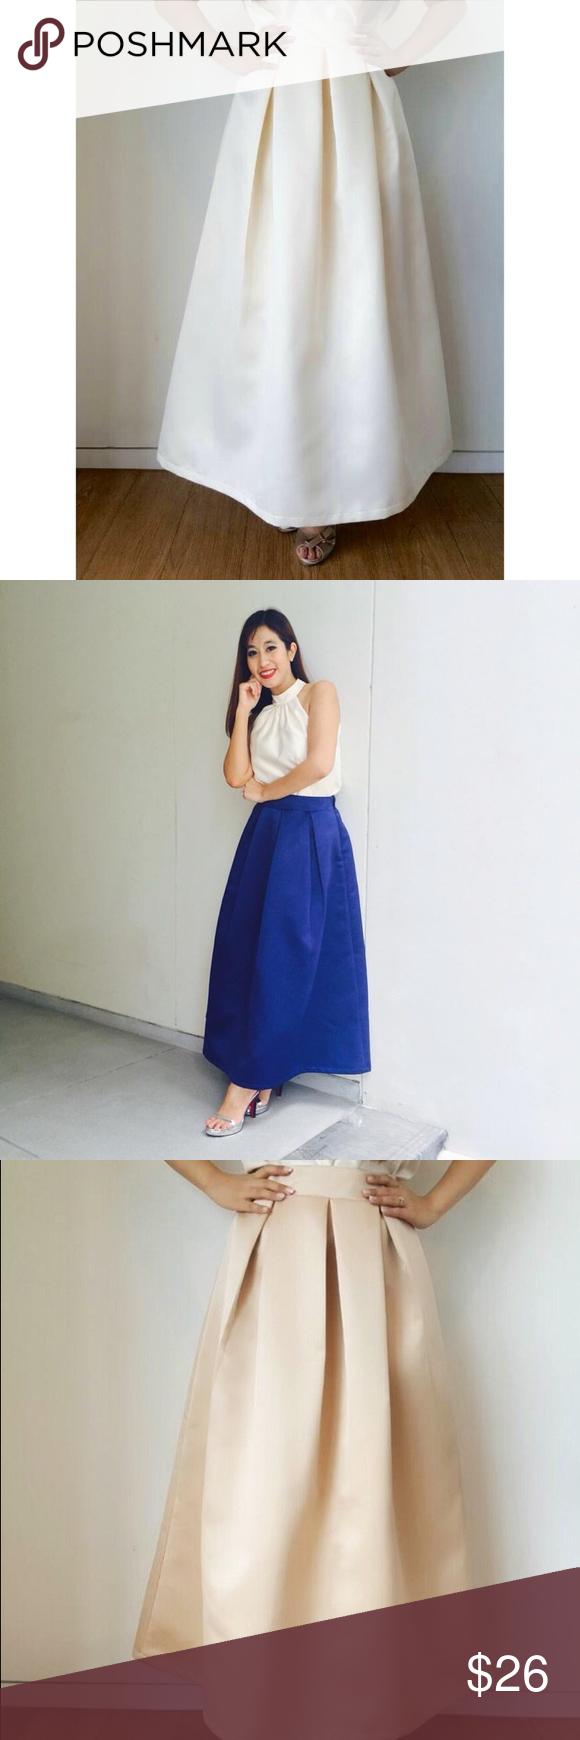 Long Vintage Maxi Skirt Boutique | Colors, Vintage and Grey